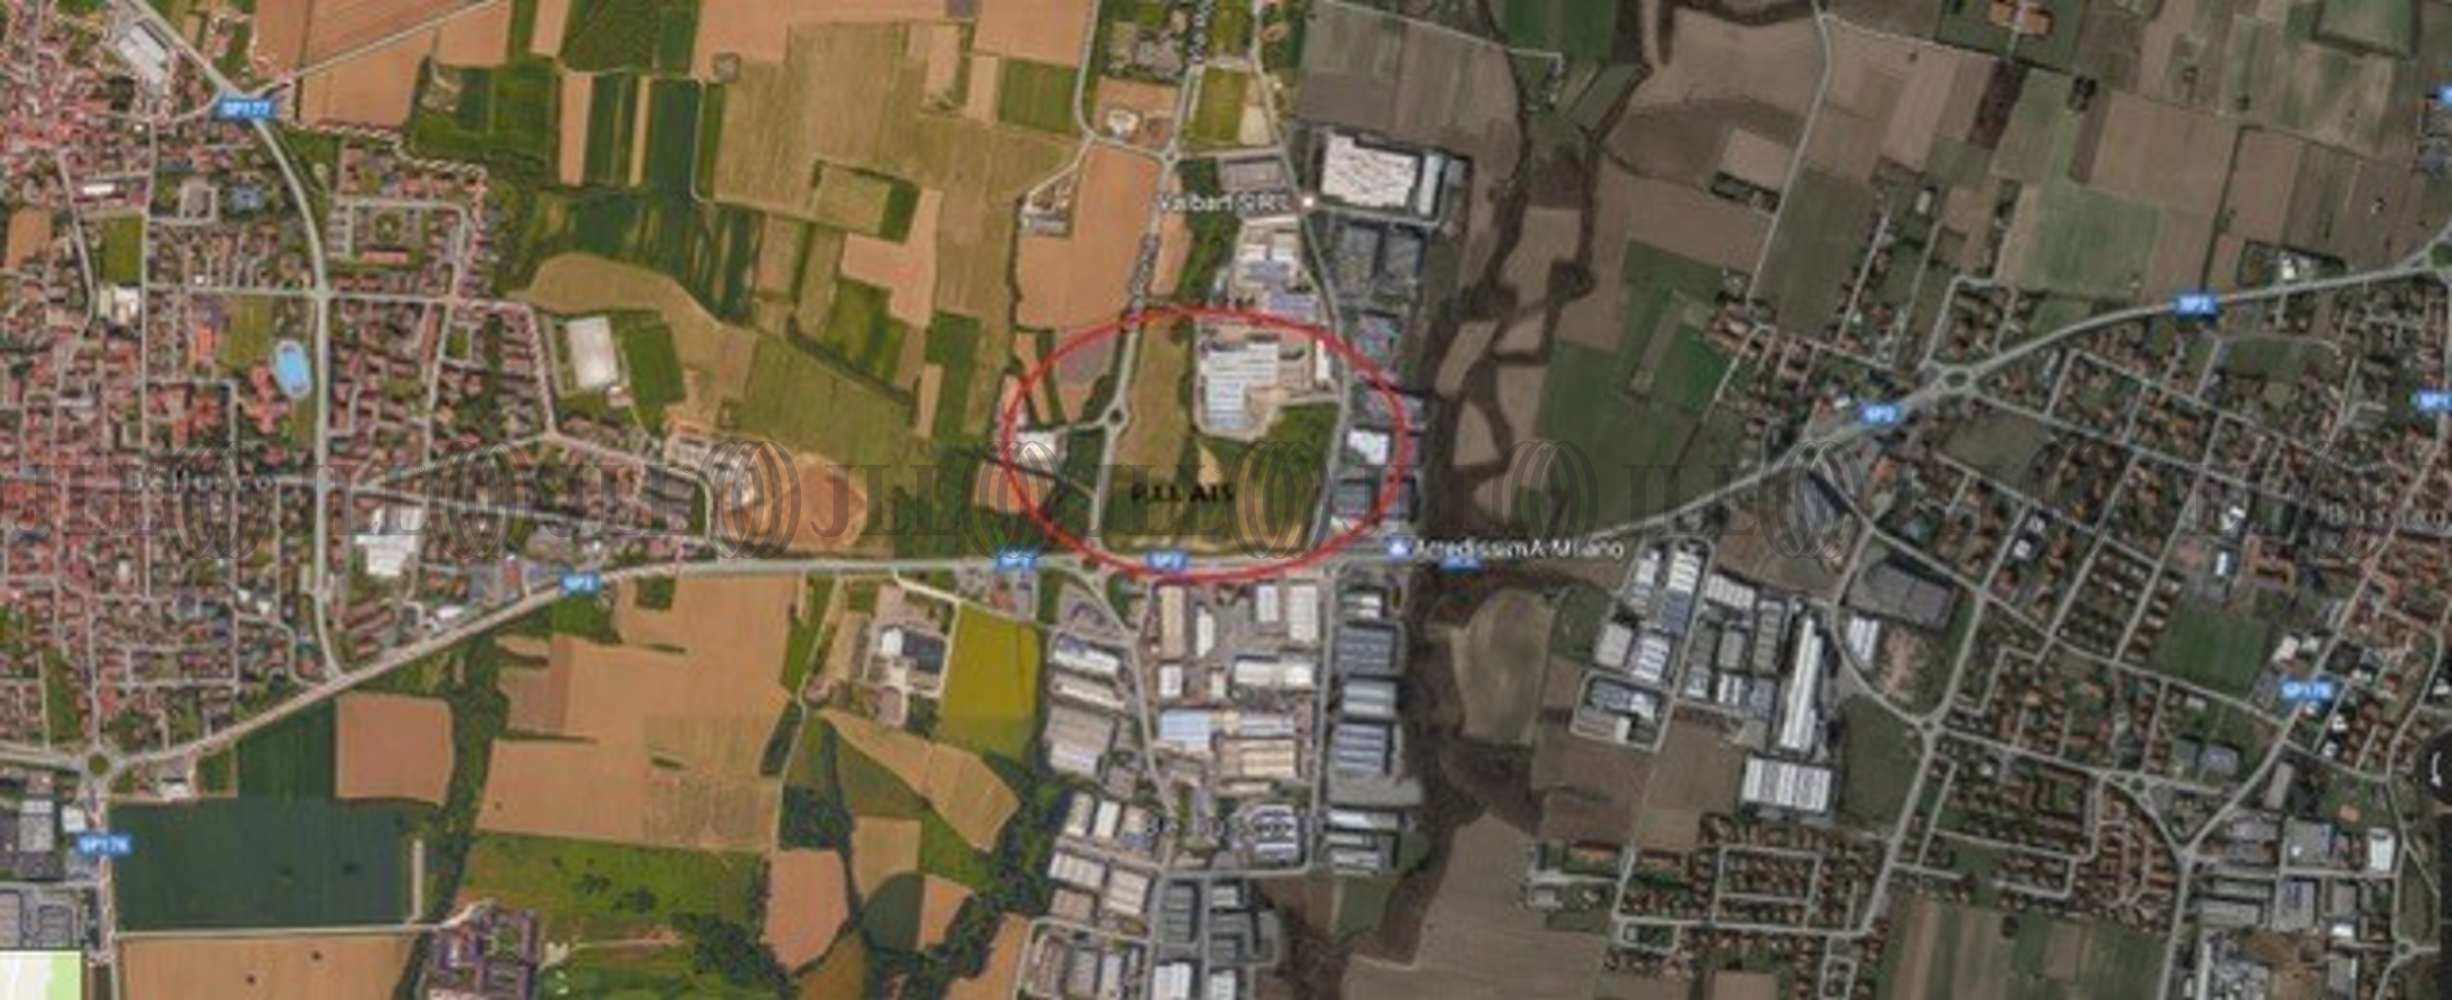 Magazzini industriali e logistici Bellusco, 20882 - Bellusco - Area per logistica